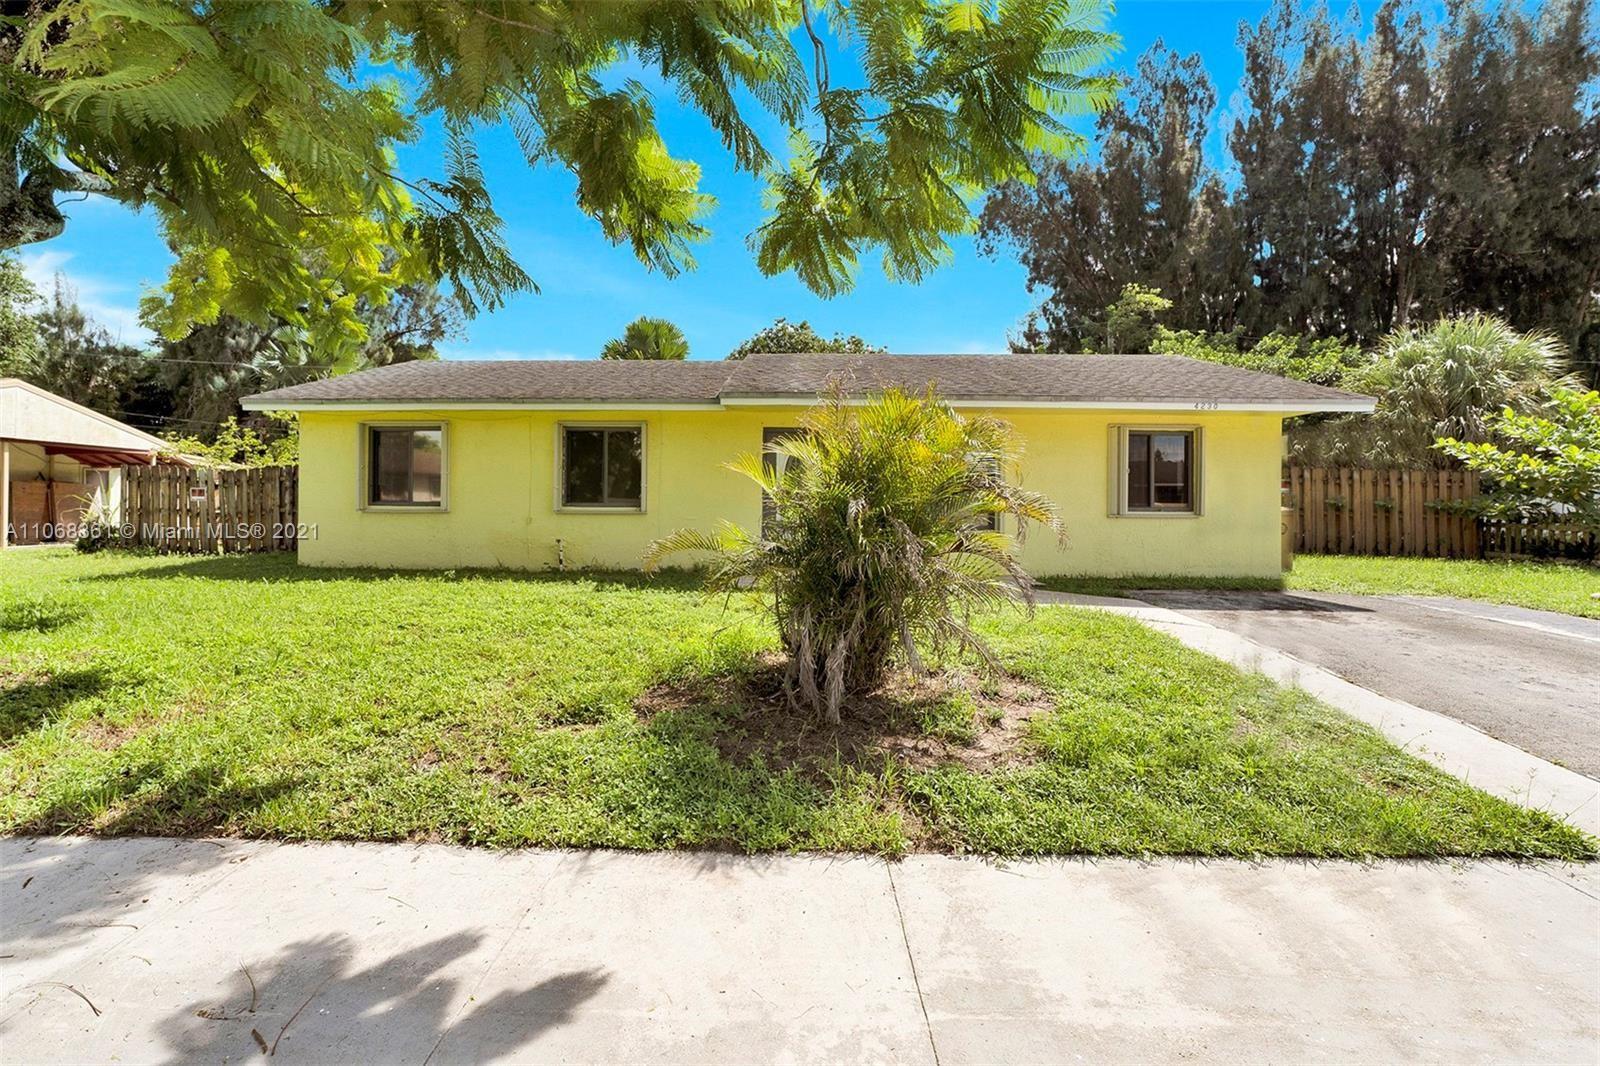 Photo of 4230 SW 55th Ave, Davie, FL 33314 (MLS # A11068361)